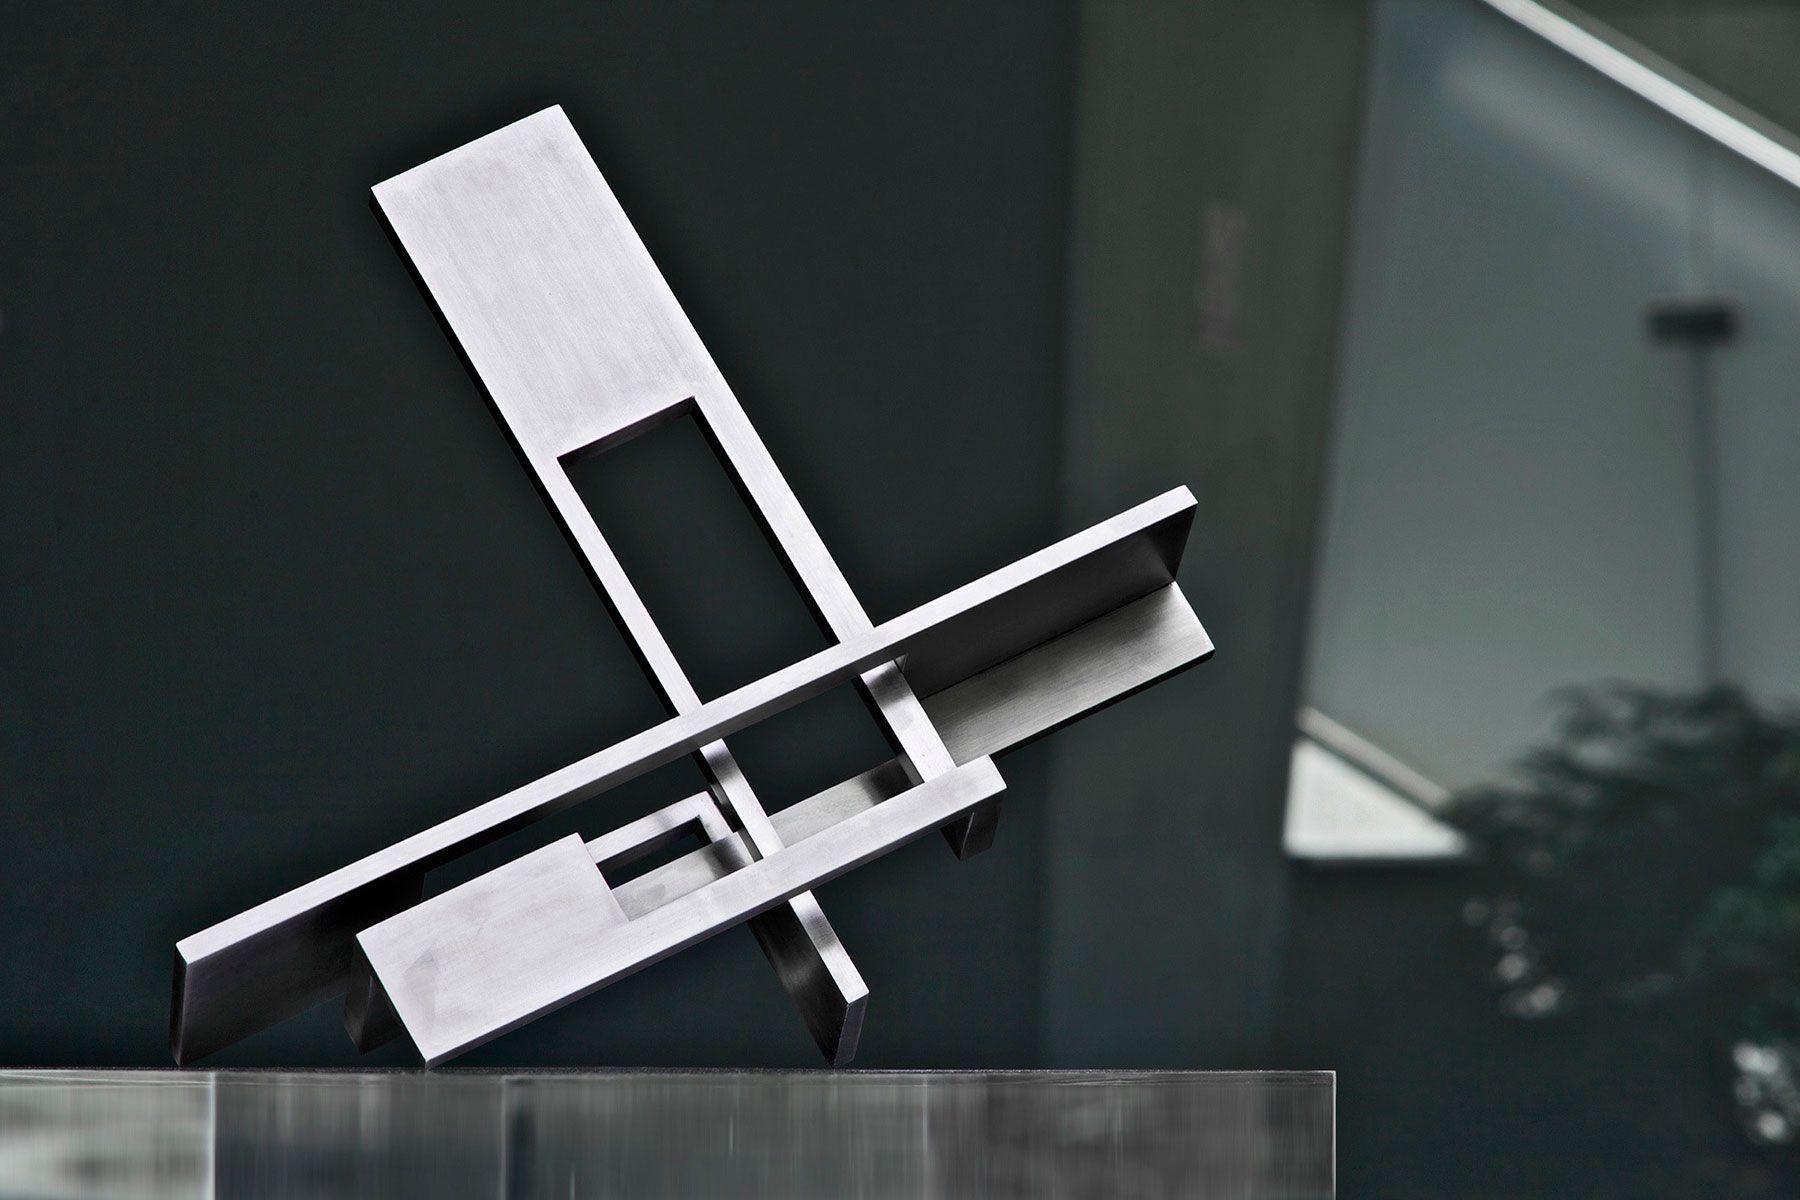 cabeza-xiii-alteracion-del-espacio-euclideo-01